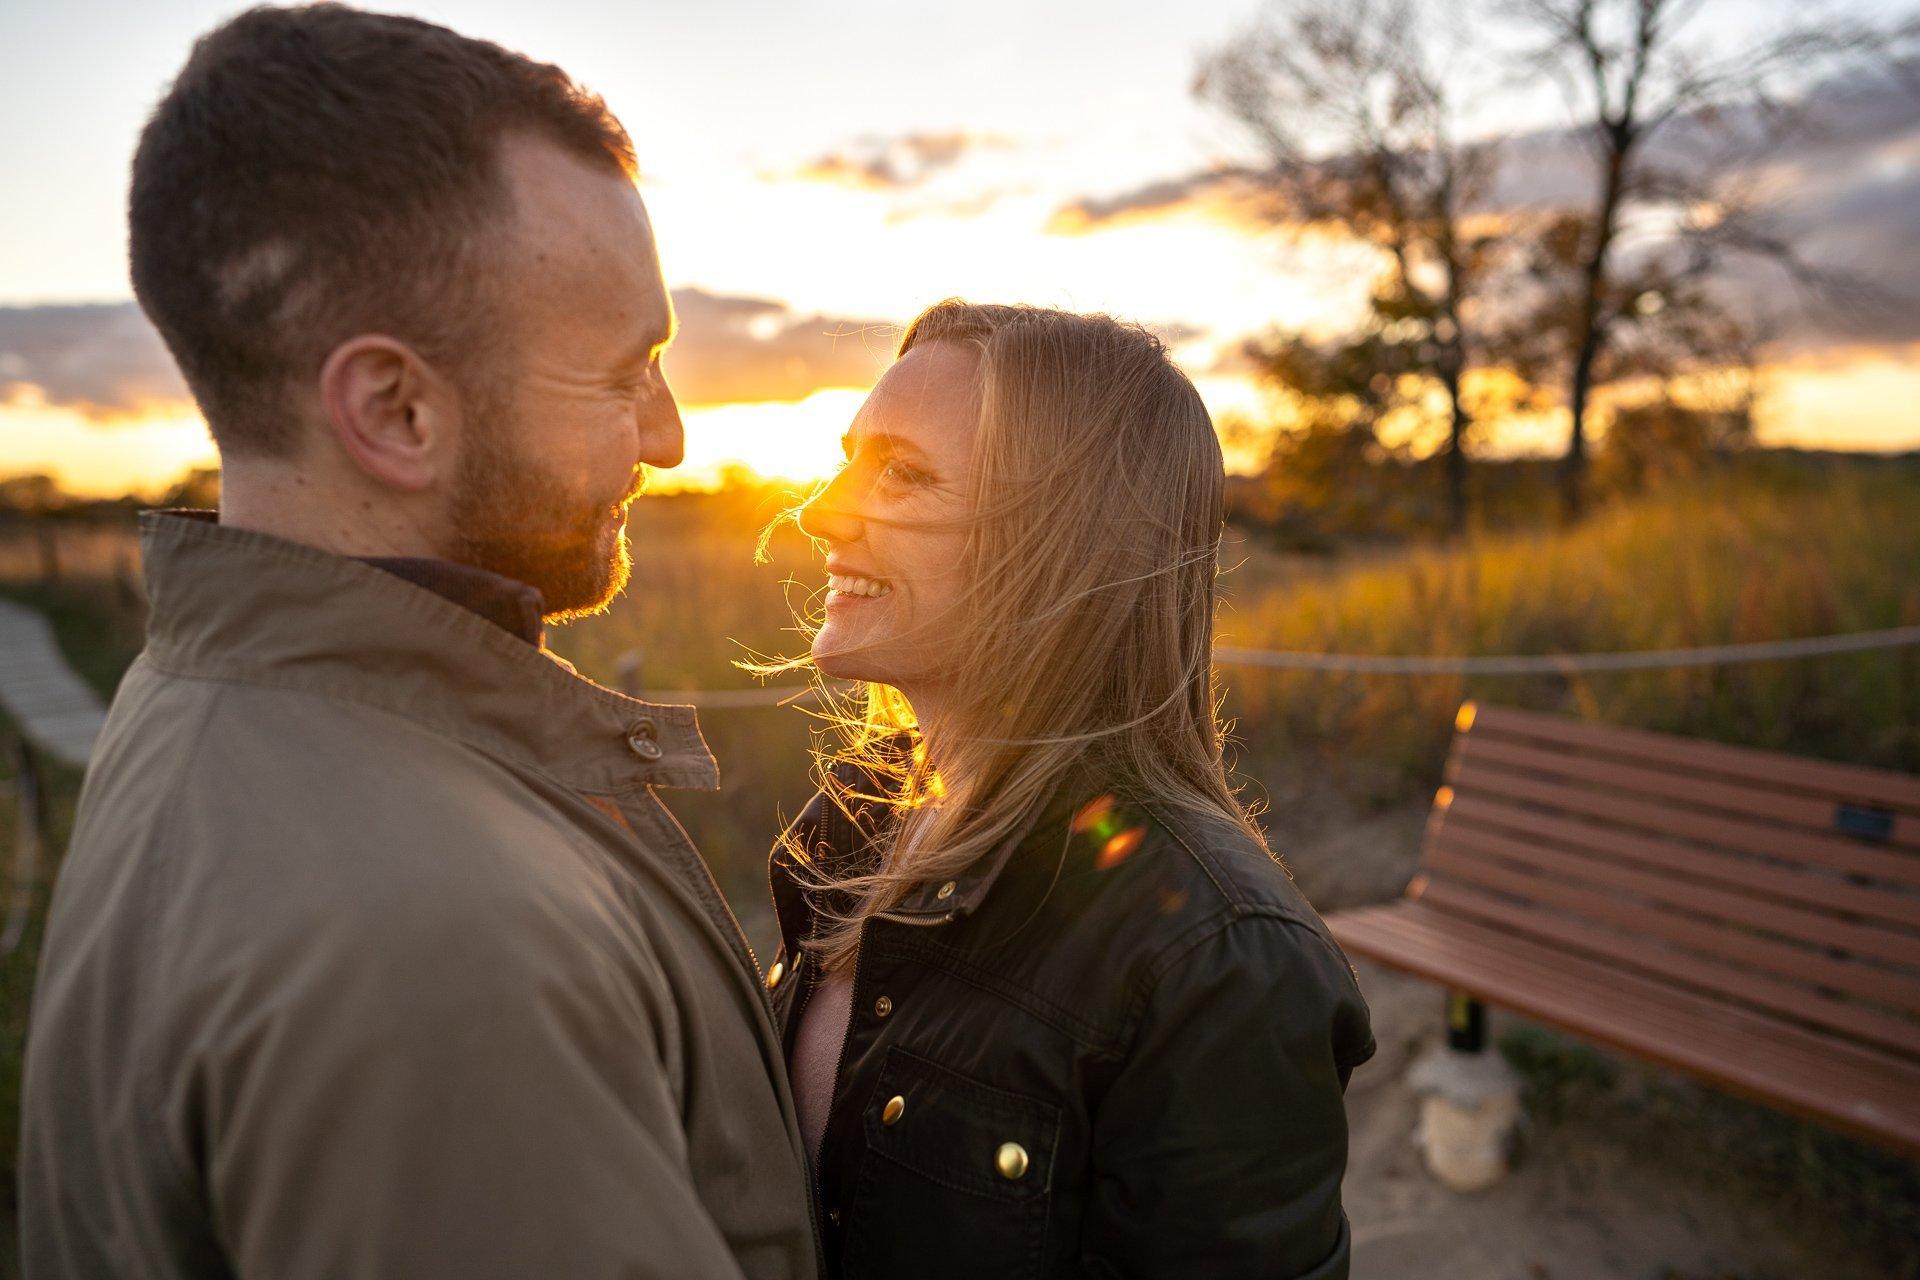 Kohler-Andrae State Park couple sunset